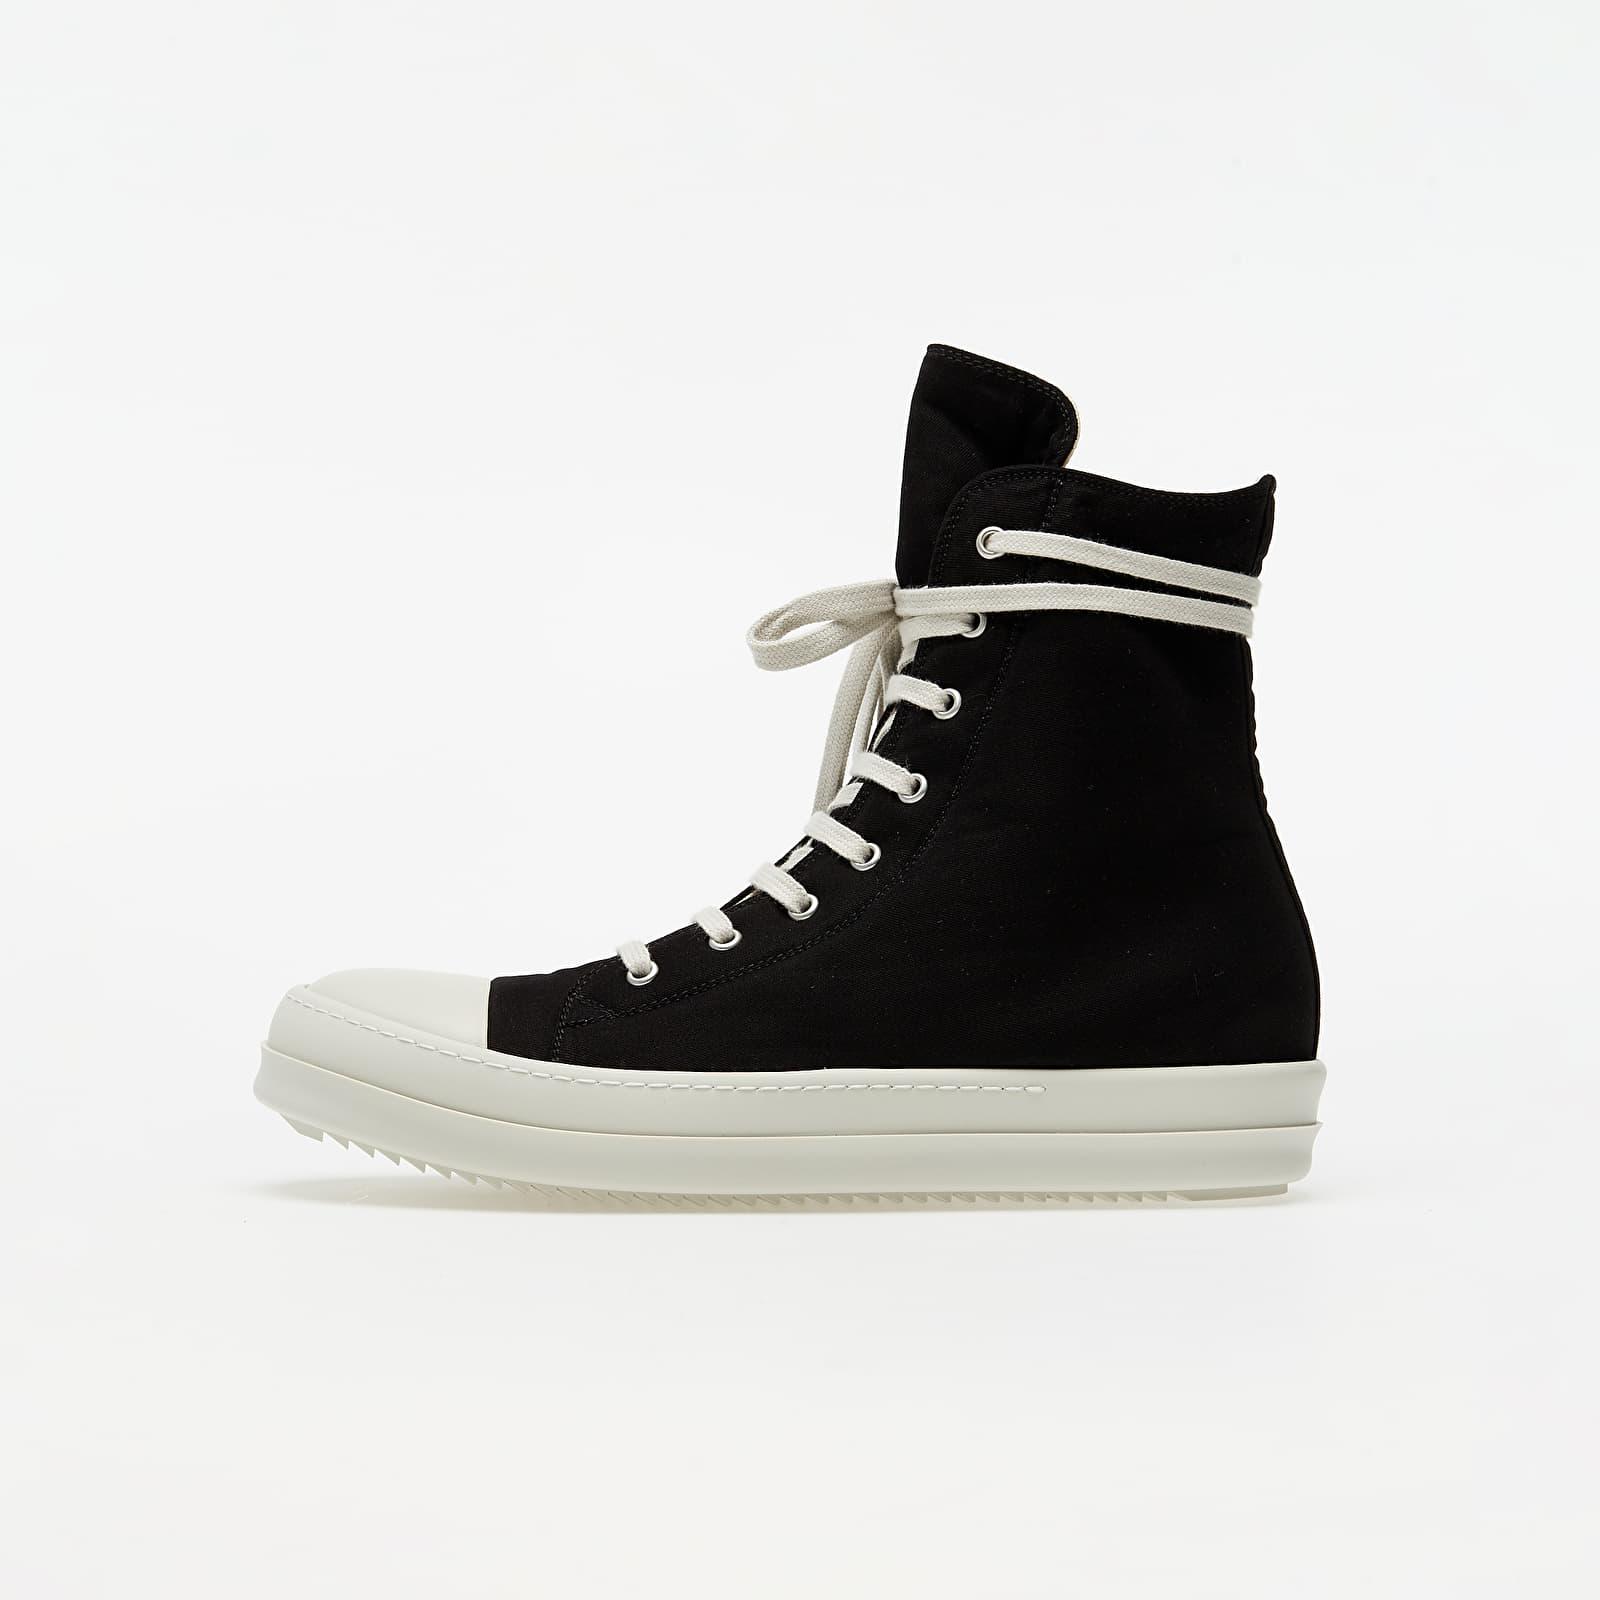 Férfi cipők Rick Owens DRKSHDW Sneaks Black/ White